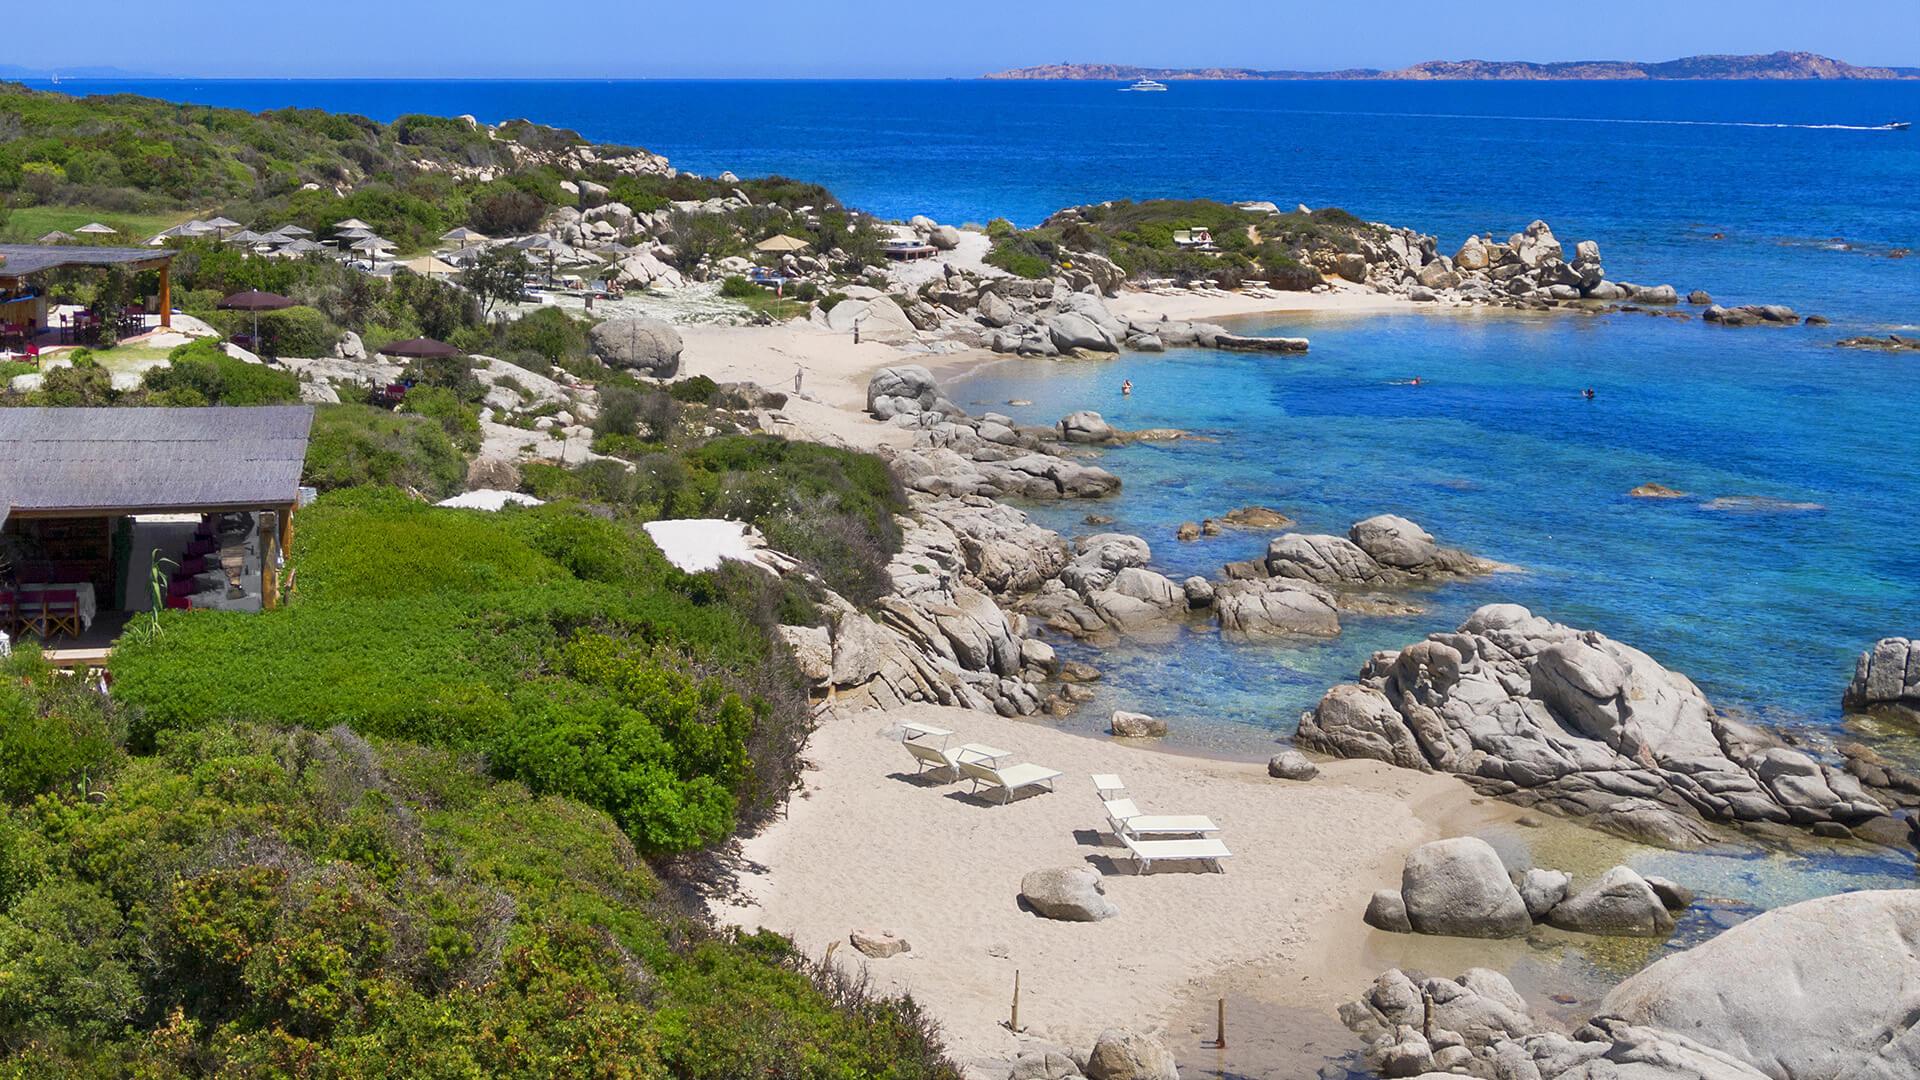 resort-valle-erica-spiaggia-licciola-santa-teresa-gallura-sardegna